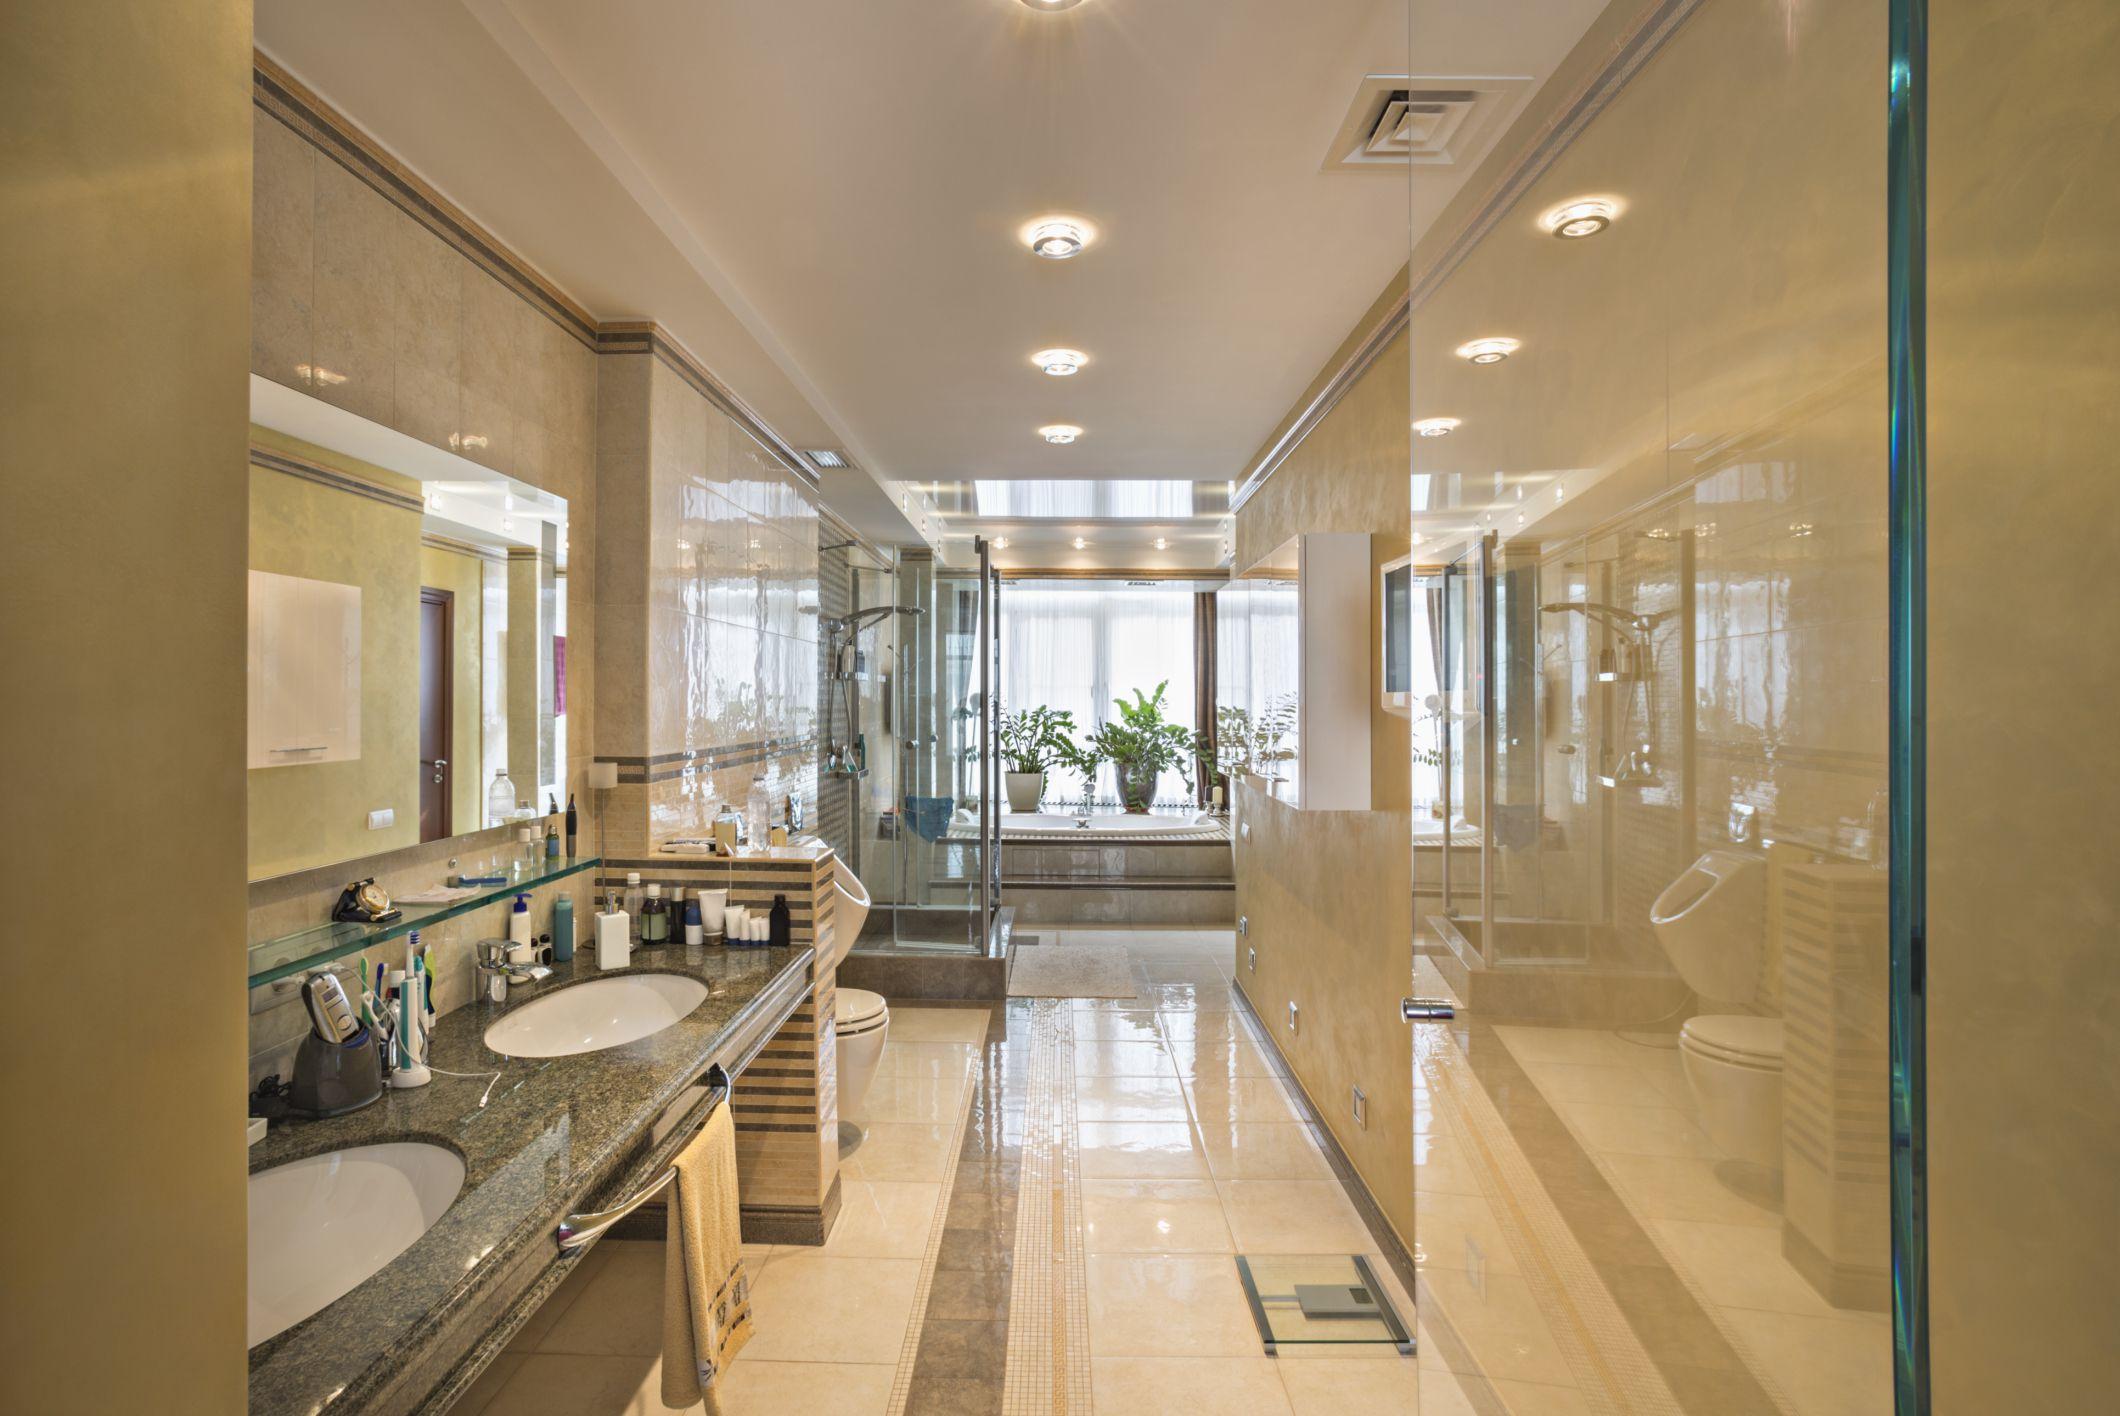 Bathroom Remodel Cost  Minimum and Medium Level Remodels